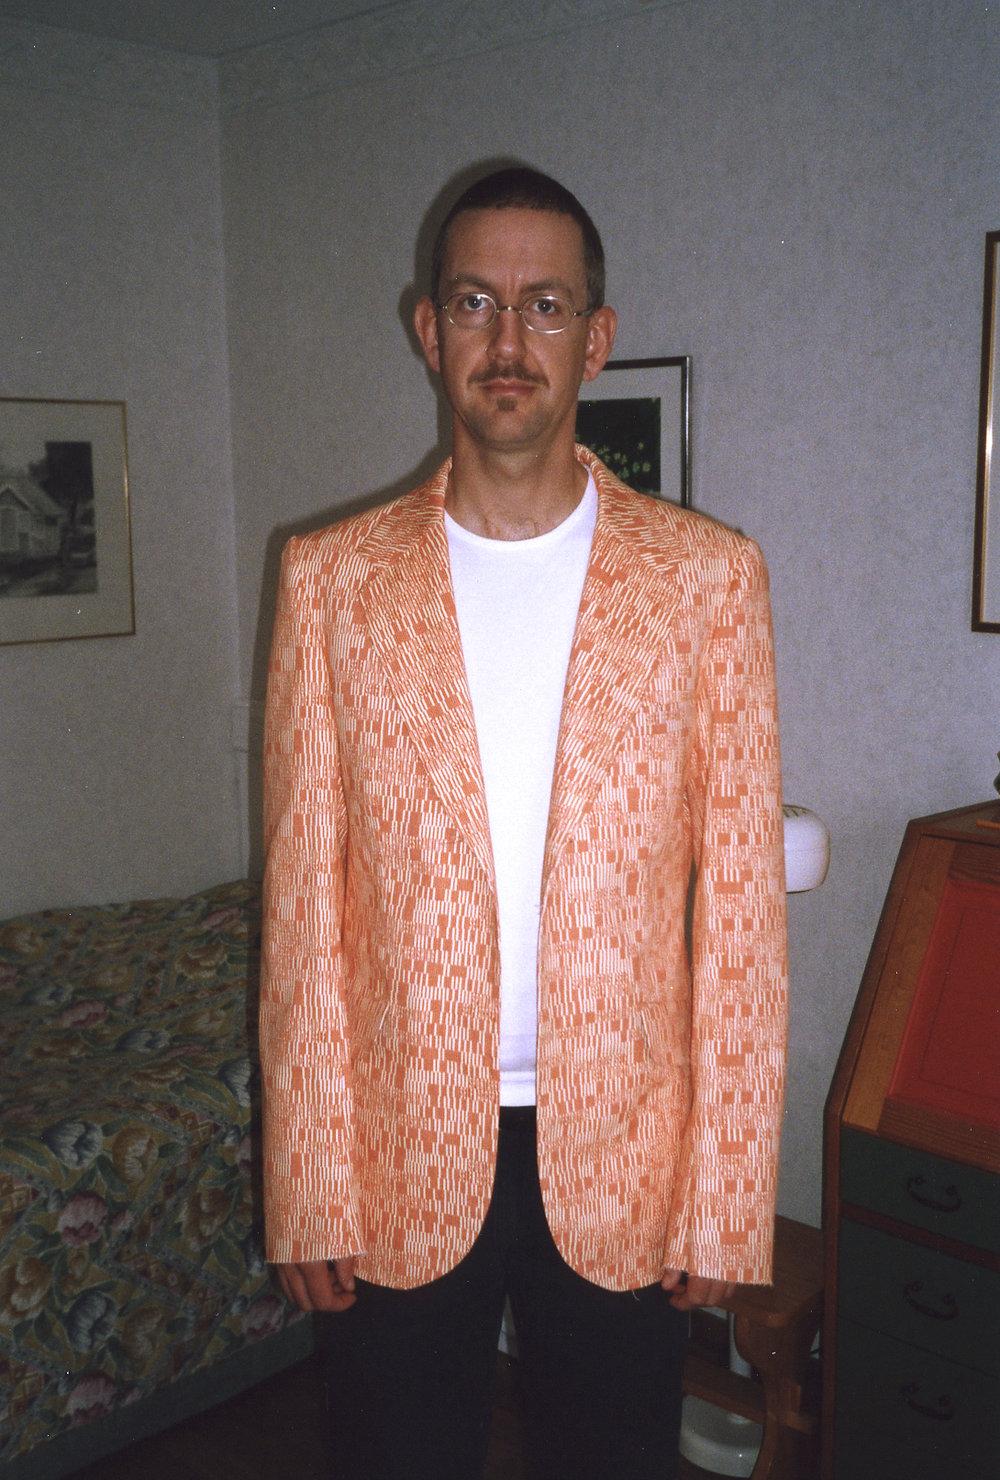 Kostym provar. hemjpg.jpg